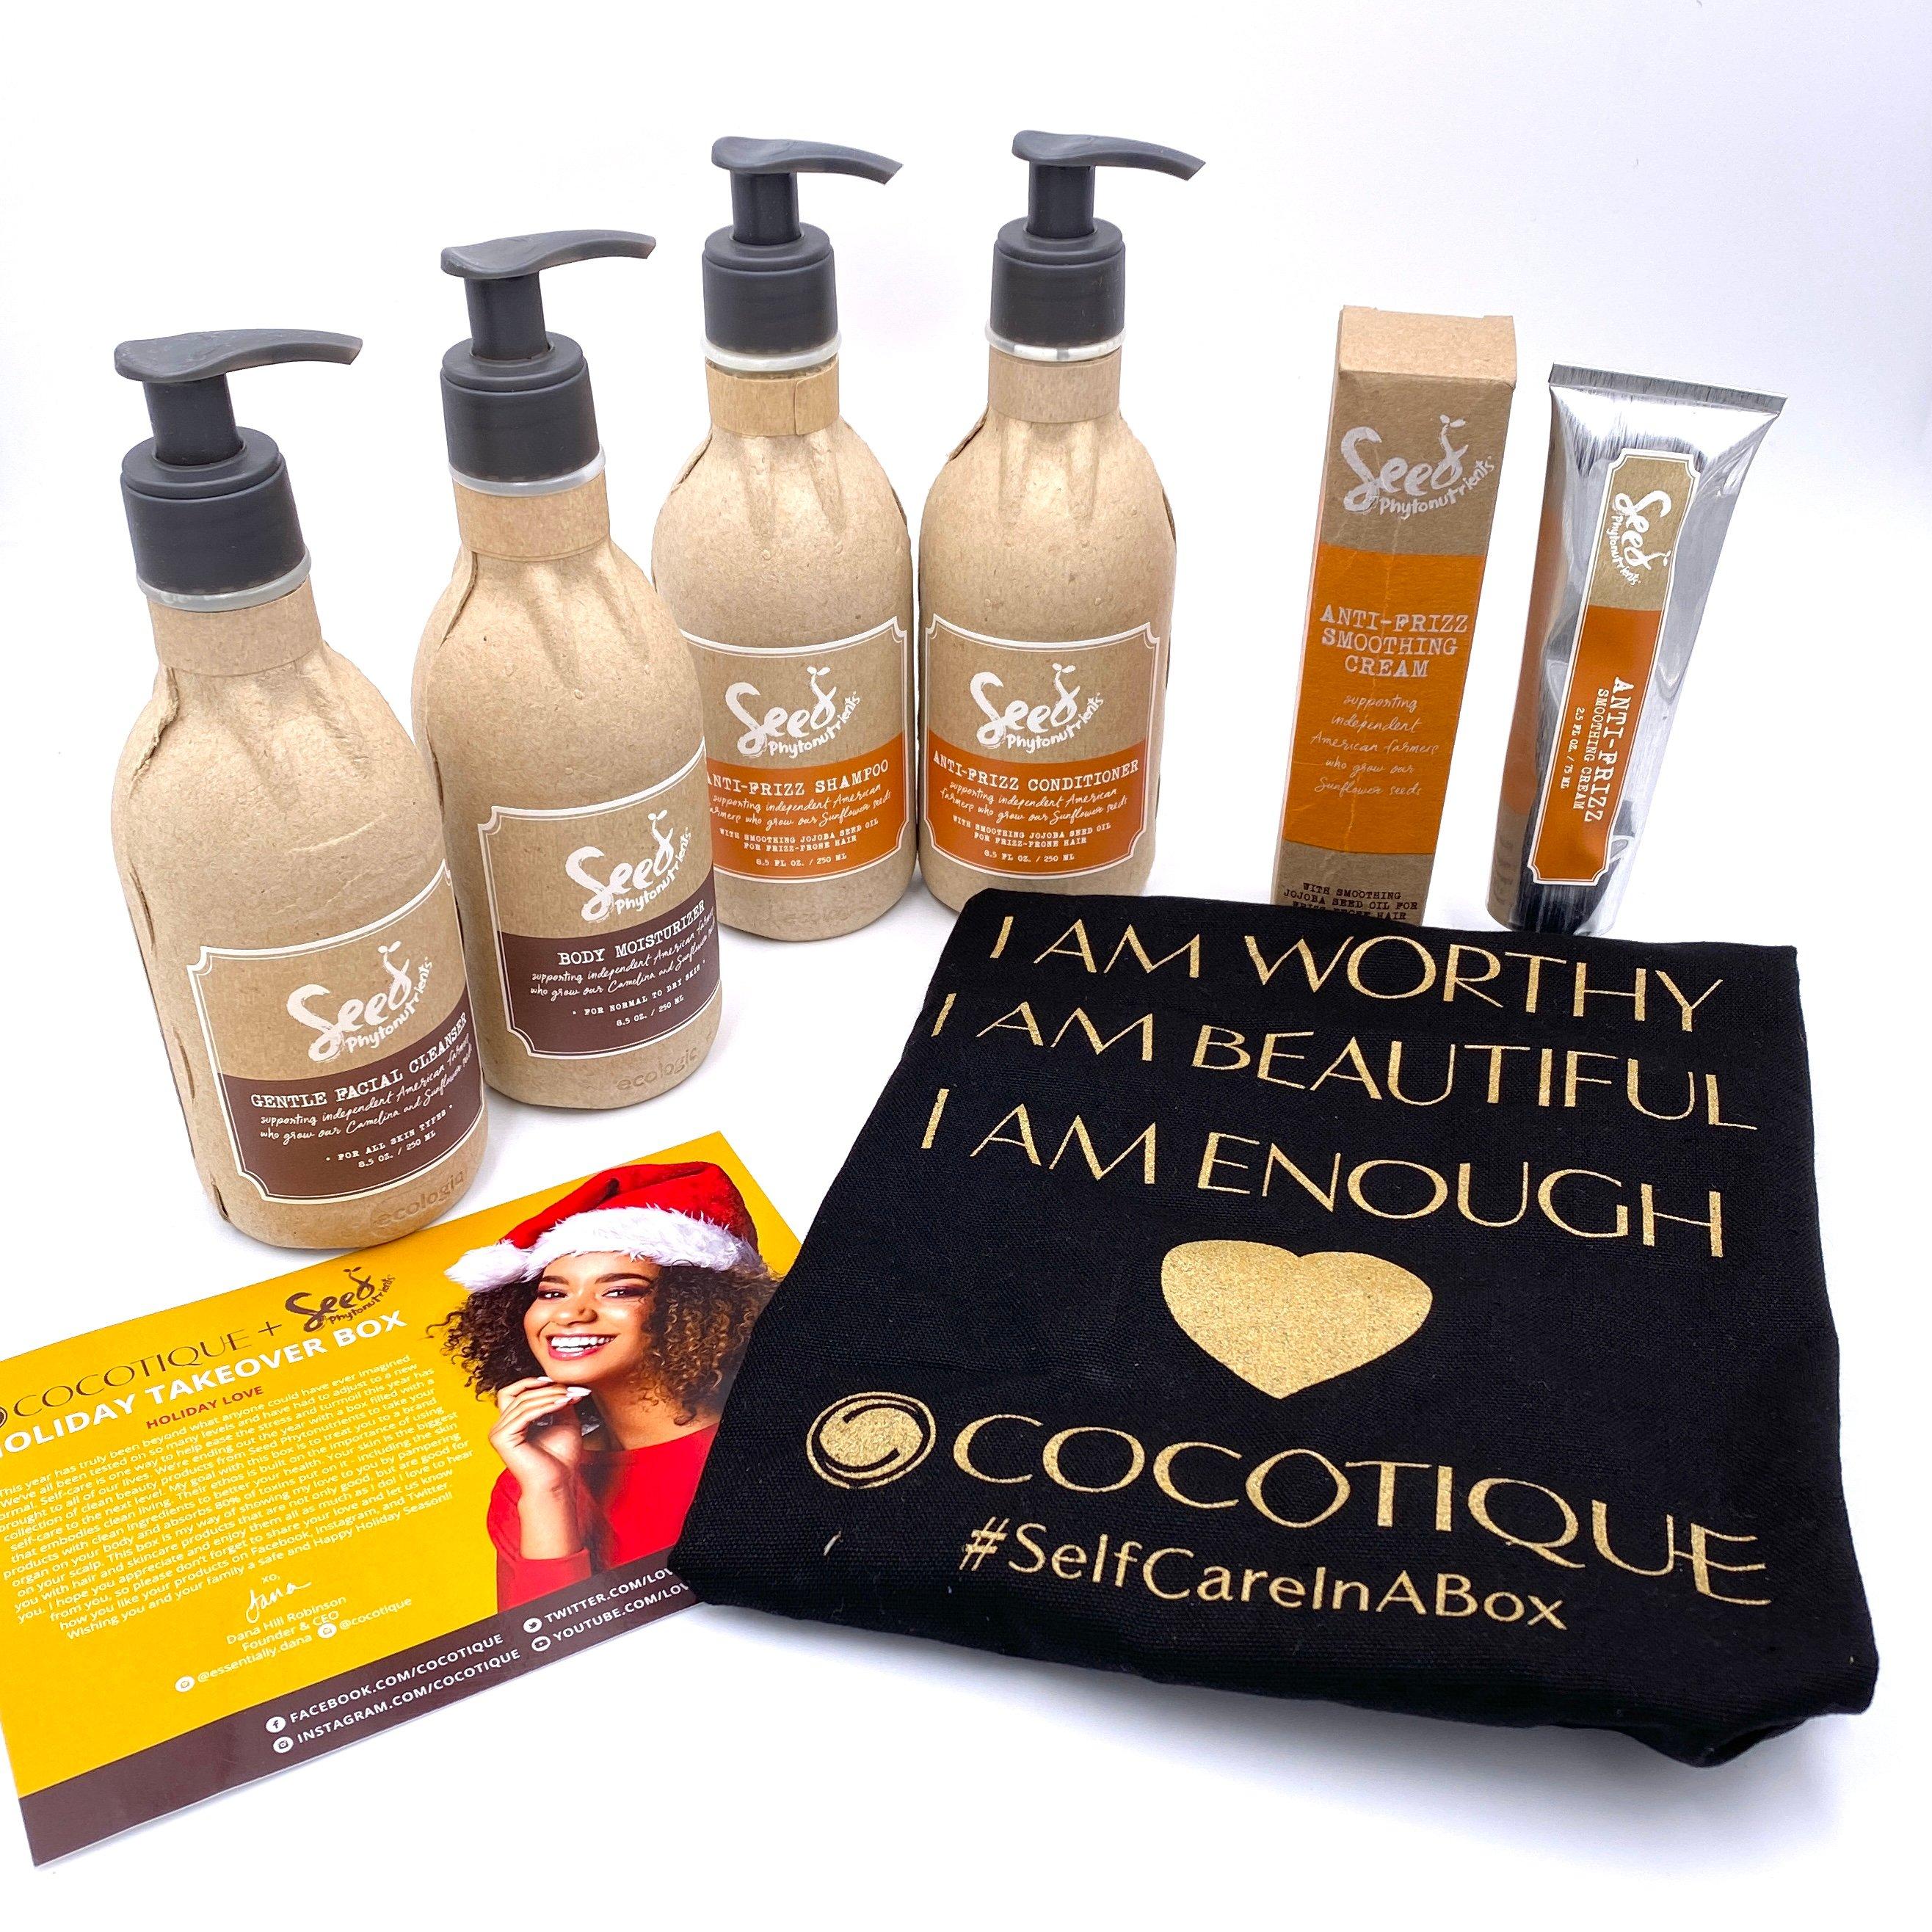 Cocotique Beauty Box Review – December 2020